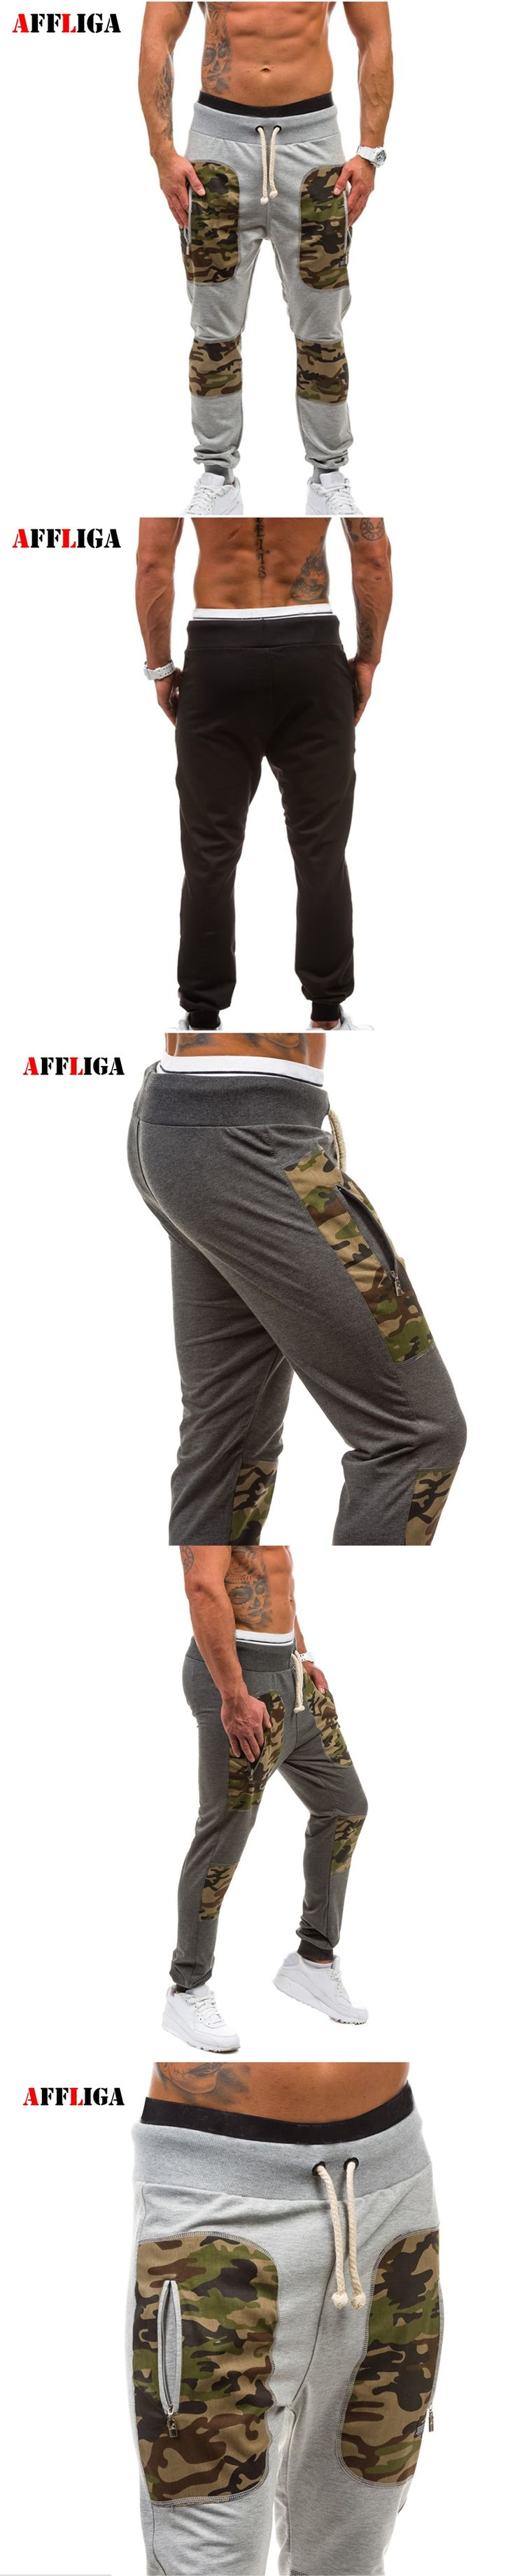 AFFLIGA Brand Mens Pants Casual Camouflage Sweatpants Outdoors Joggers Pants Trousers Men's Bodybuilding Clothing Sweatpants